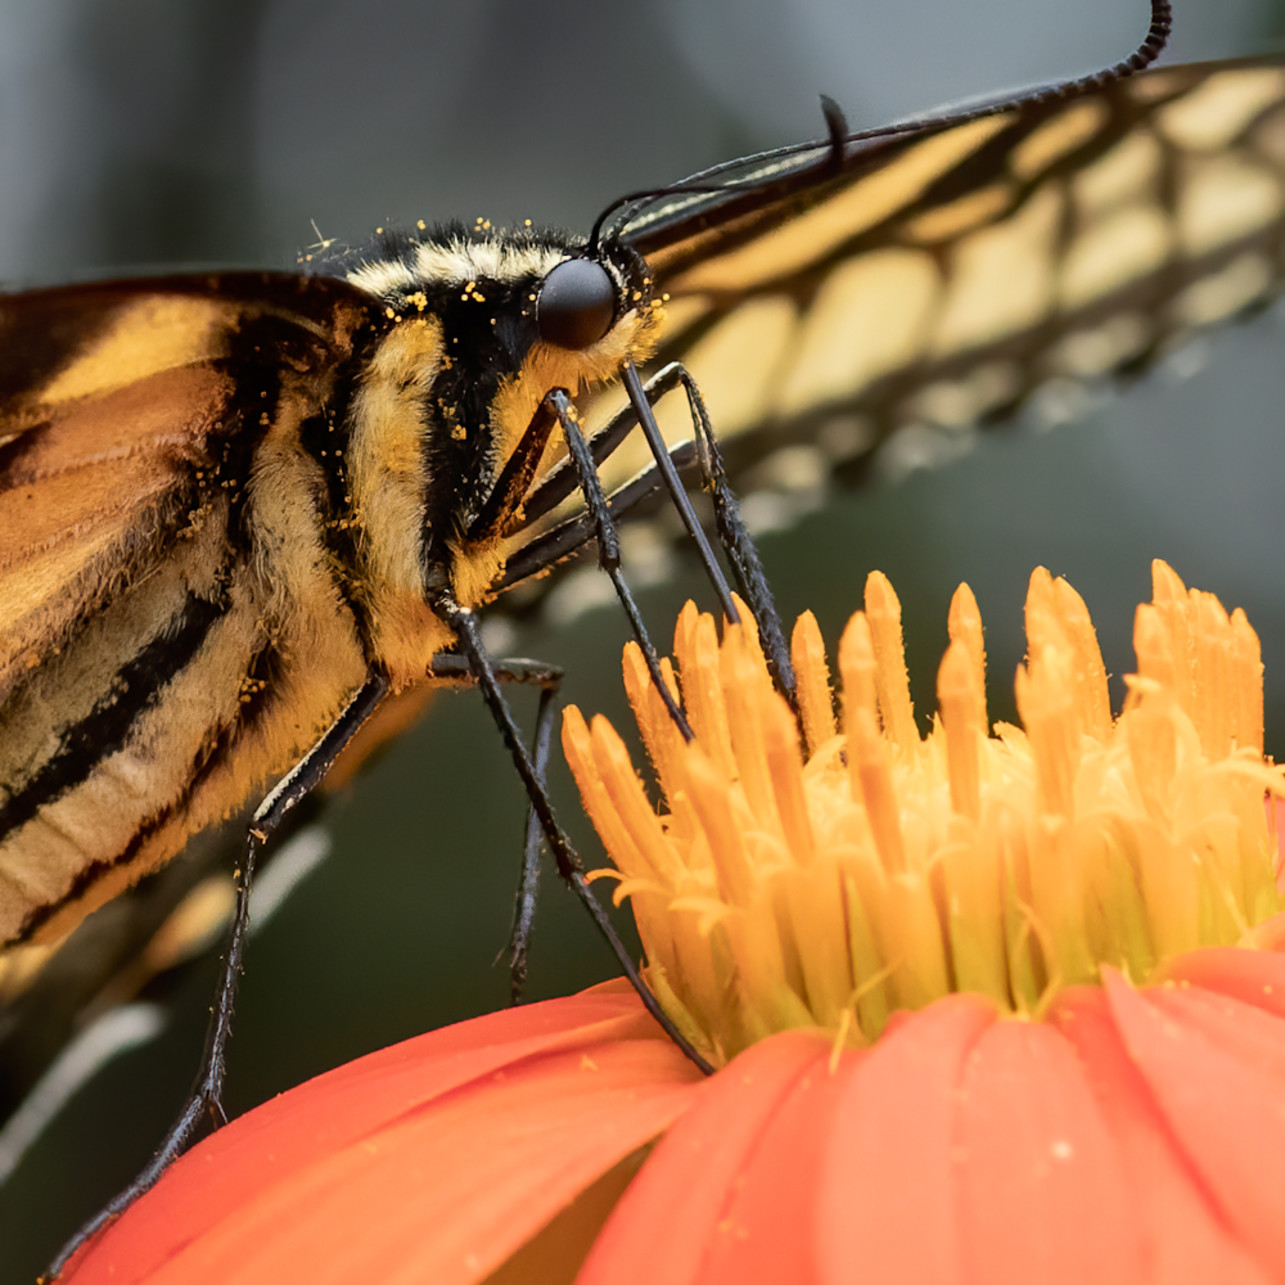 Eastern tiger swallowtail butterfly feeding rnzkto